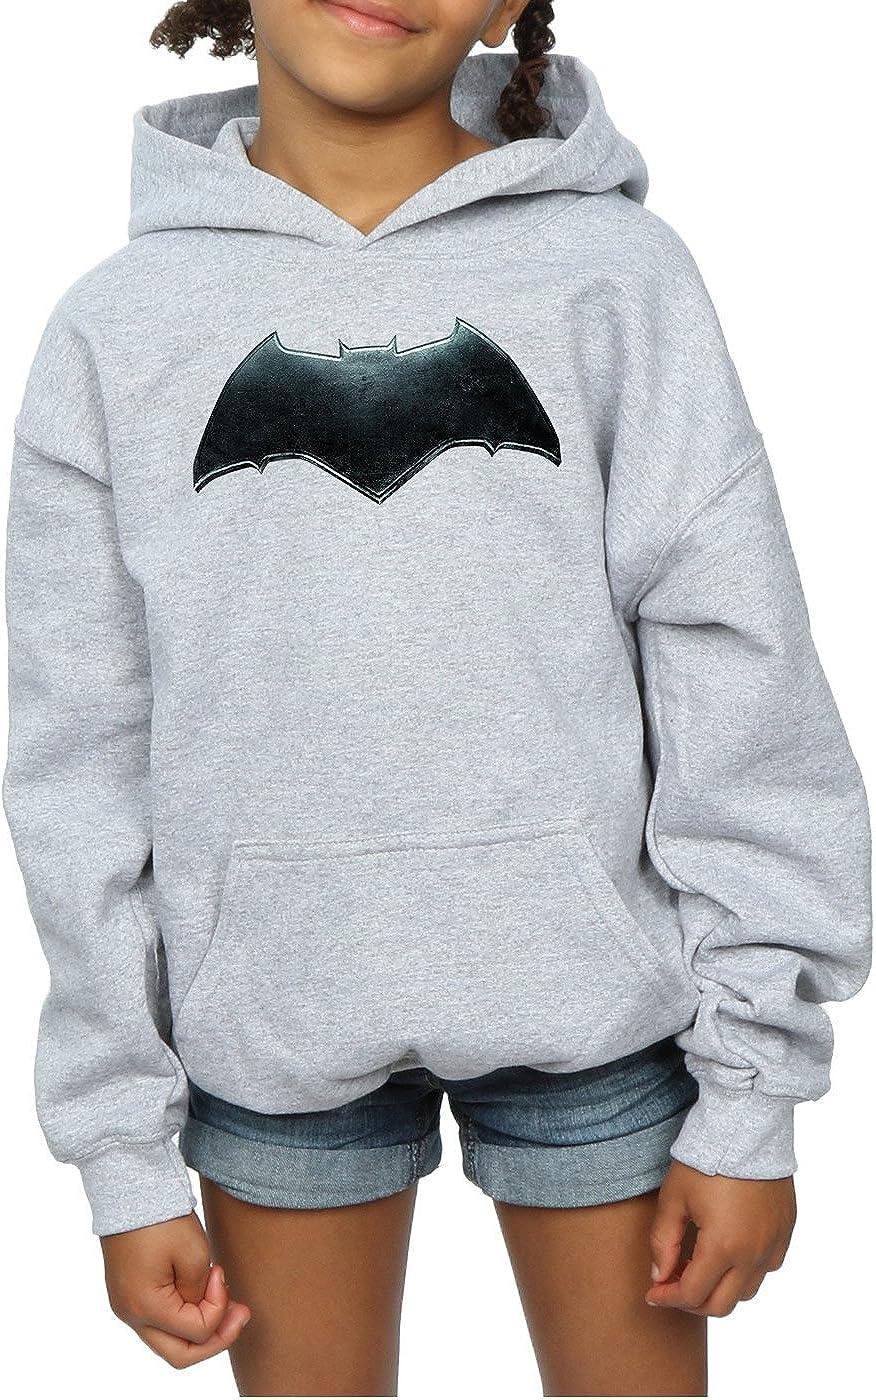 DC Comics Girls Justice League Movie Batman Emblem Hoodie